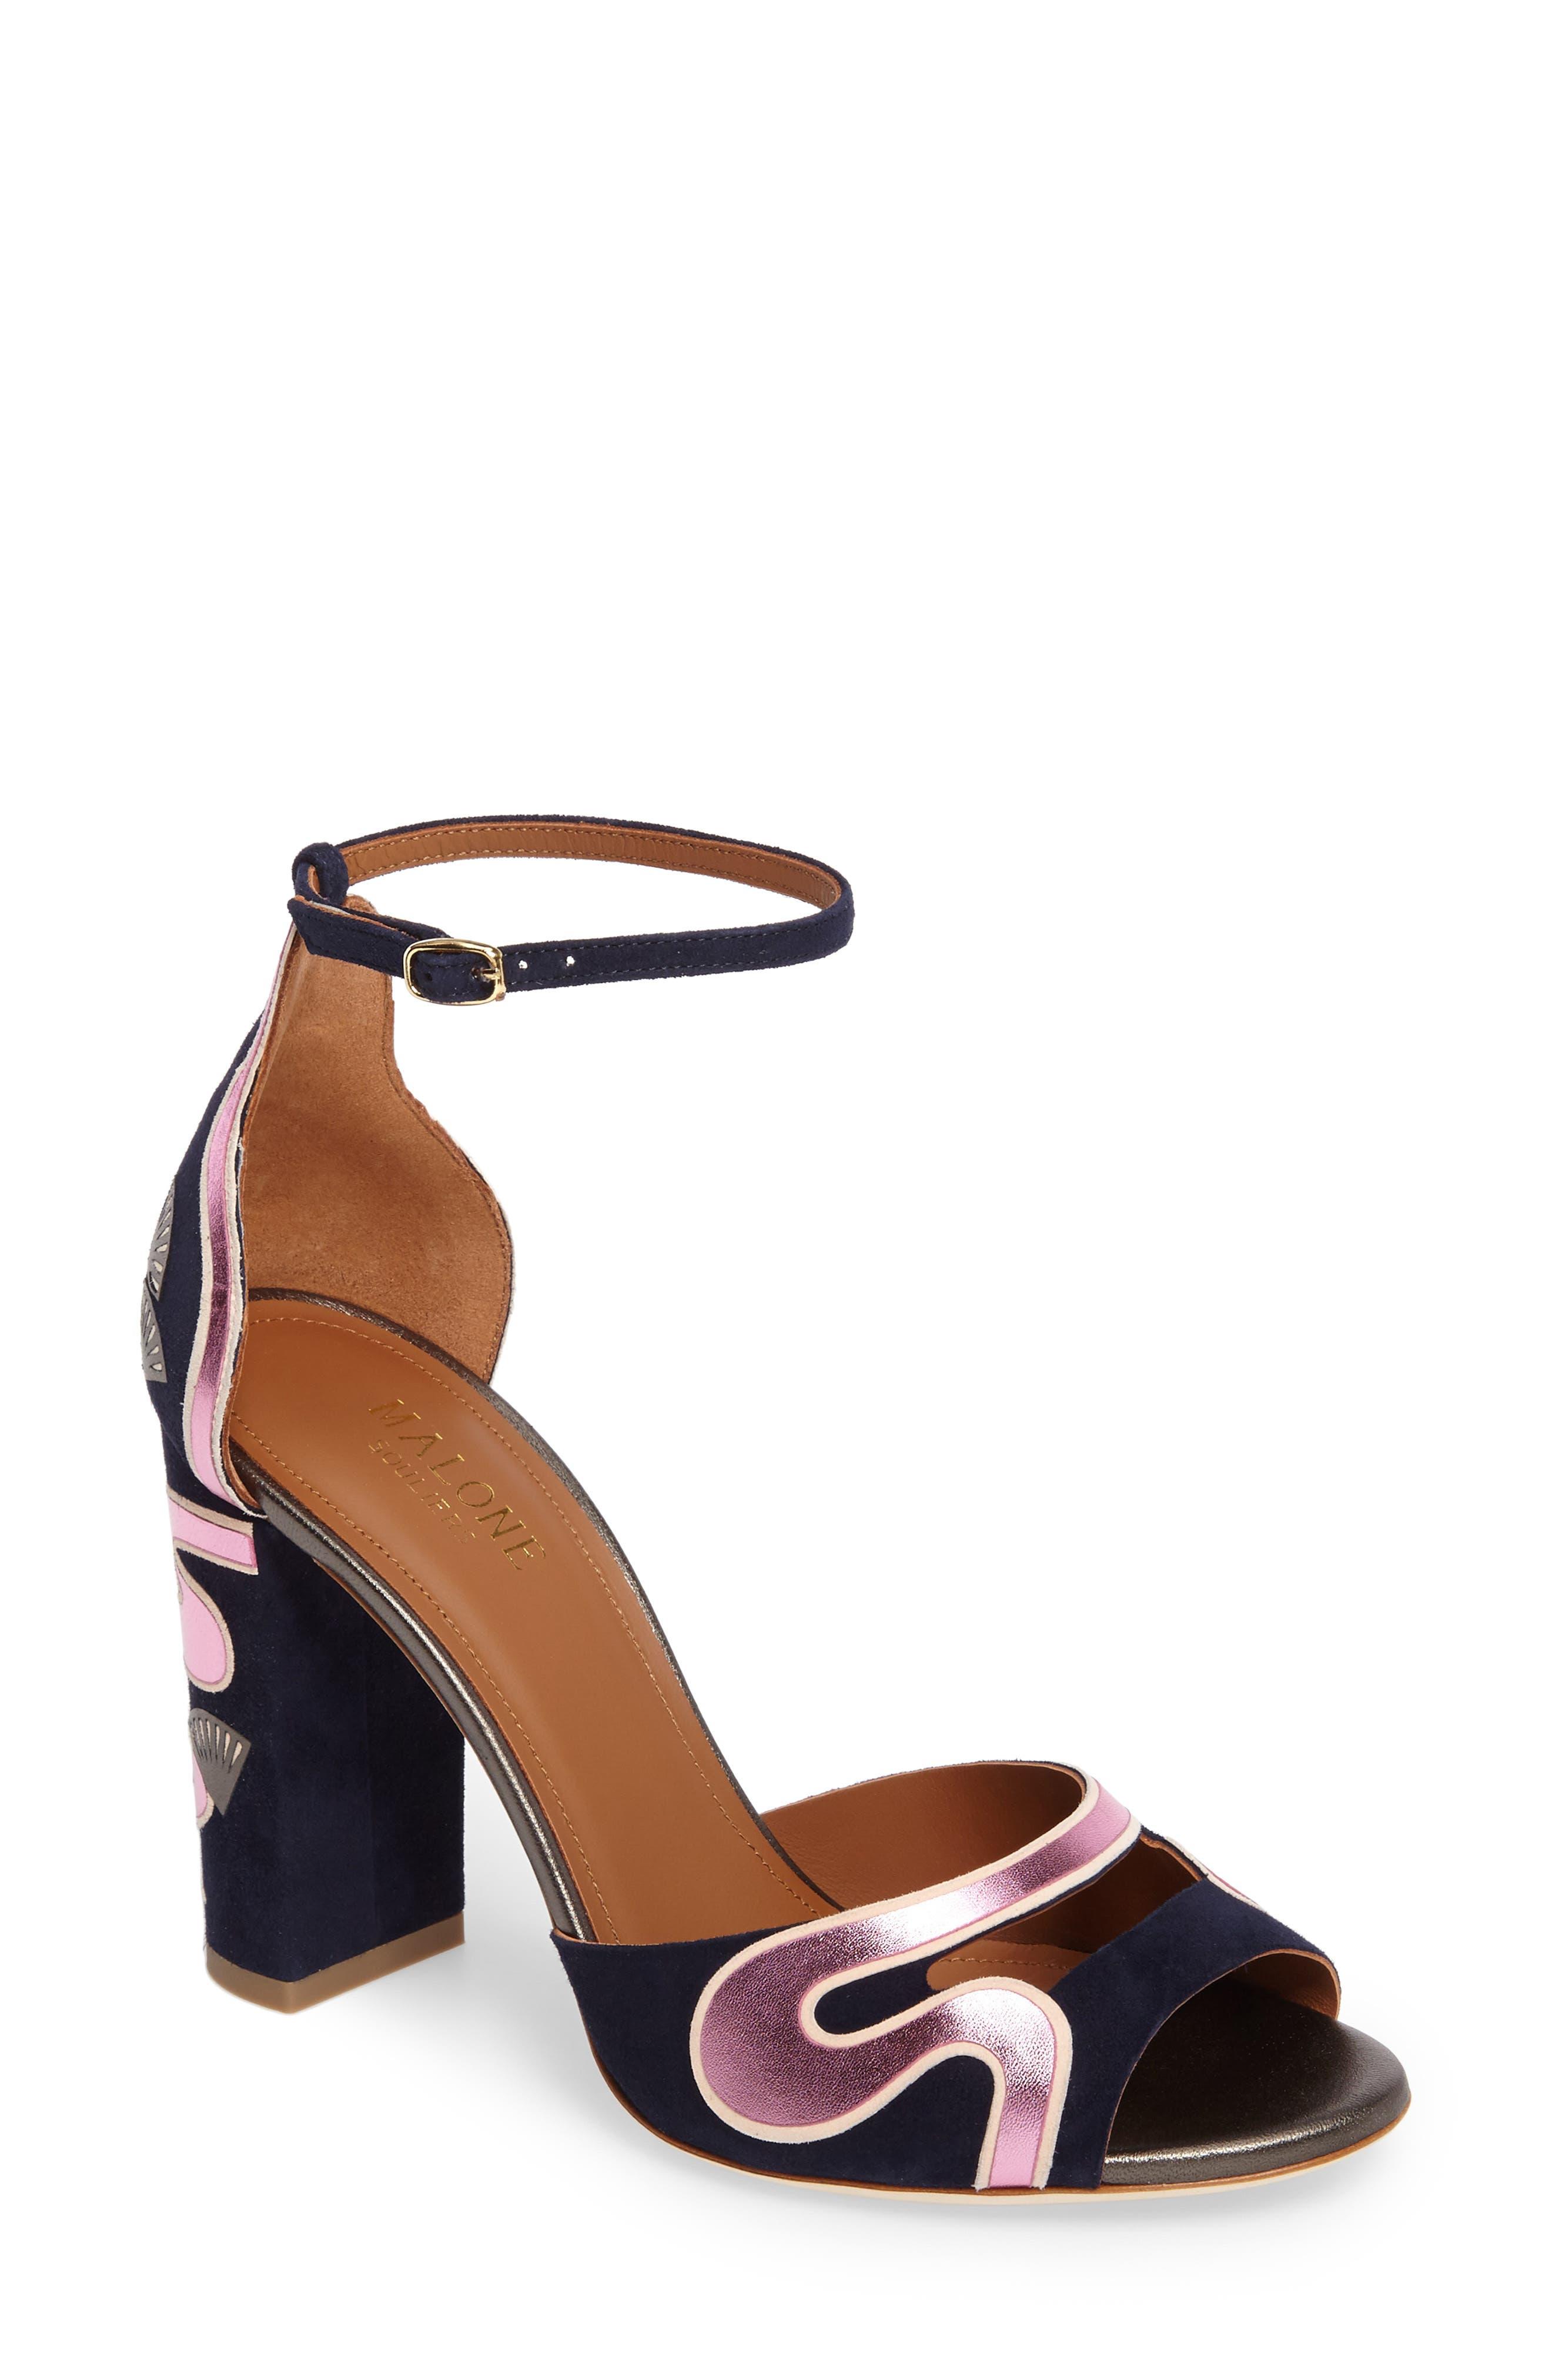 Main Image - Malone Souliers Nina Chunky Heel Sandal (Women)